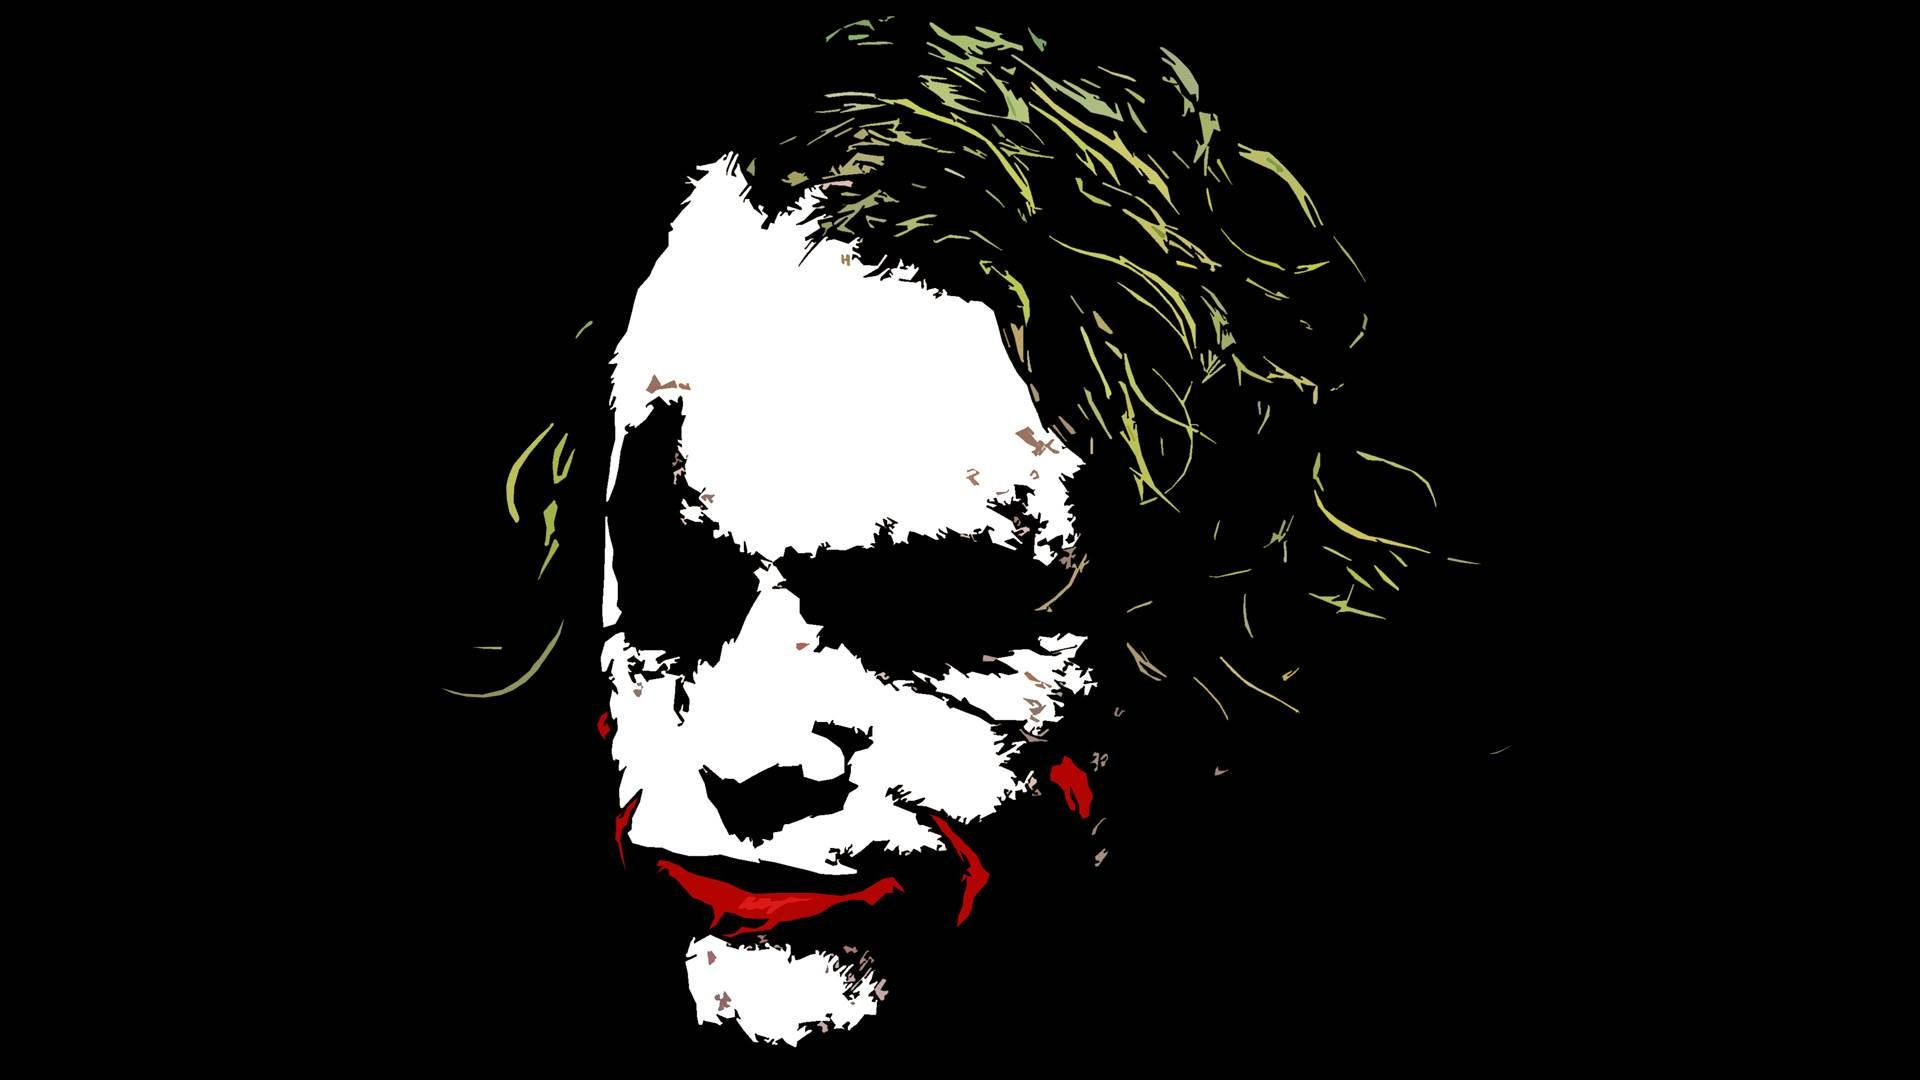 Joker Hd Wallpapers Backgrounds Wallpaper 1920 1080 Joker Images